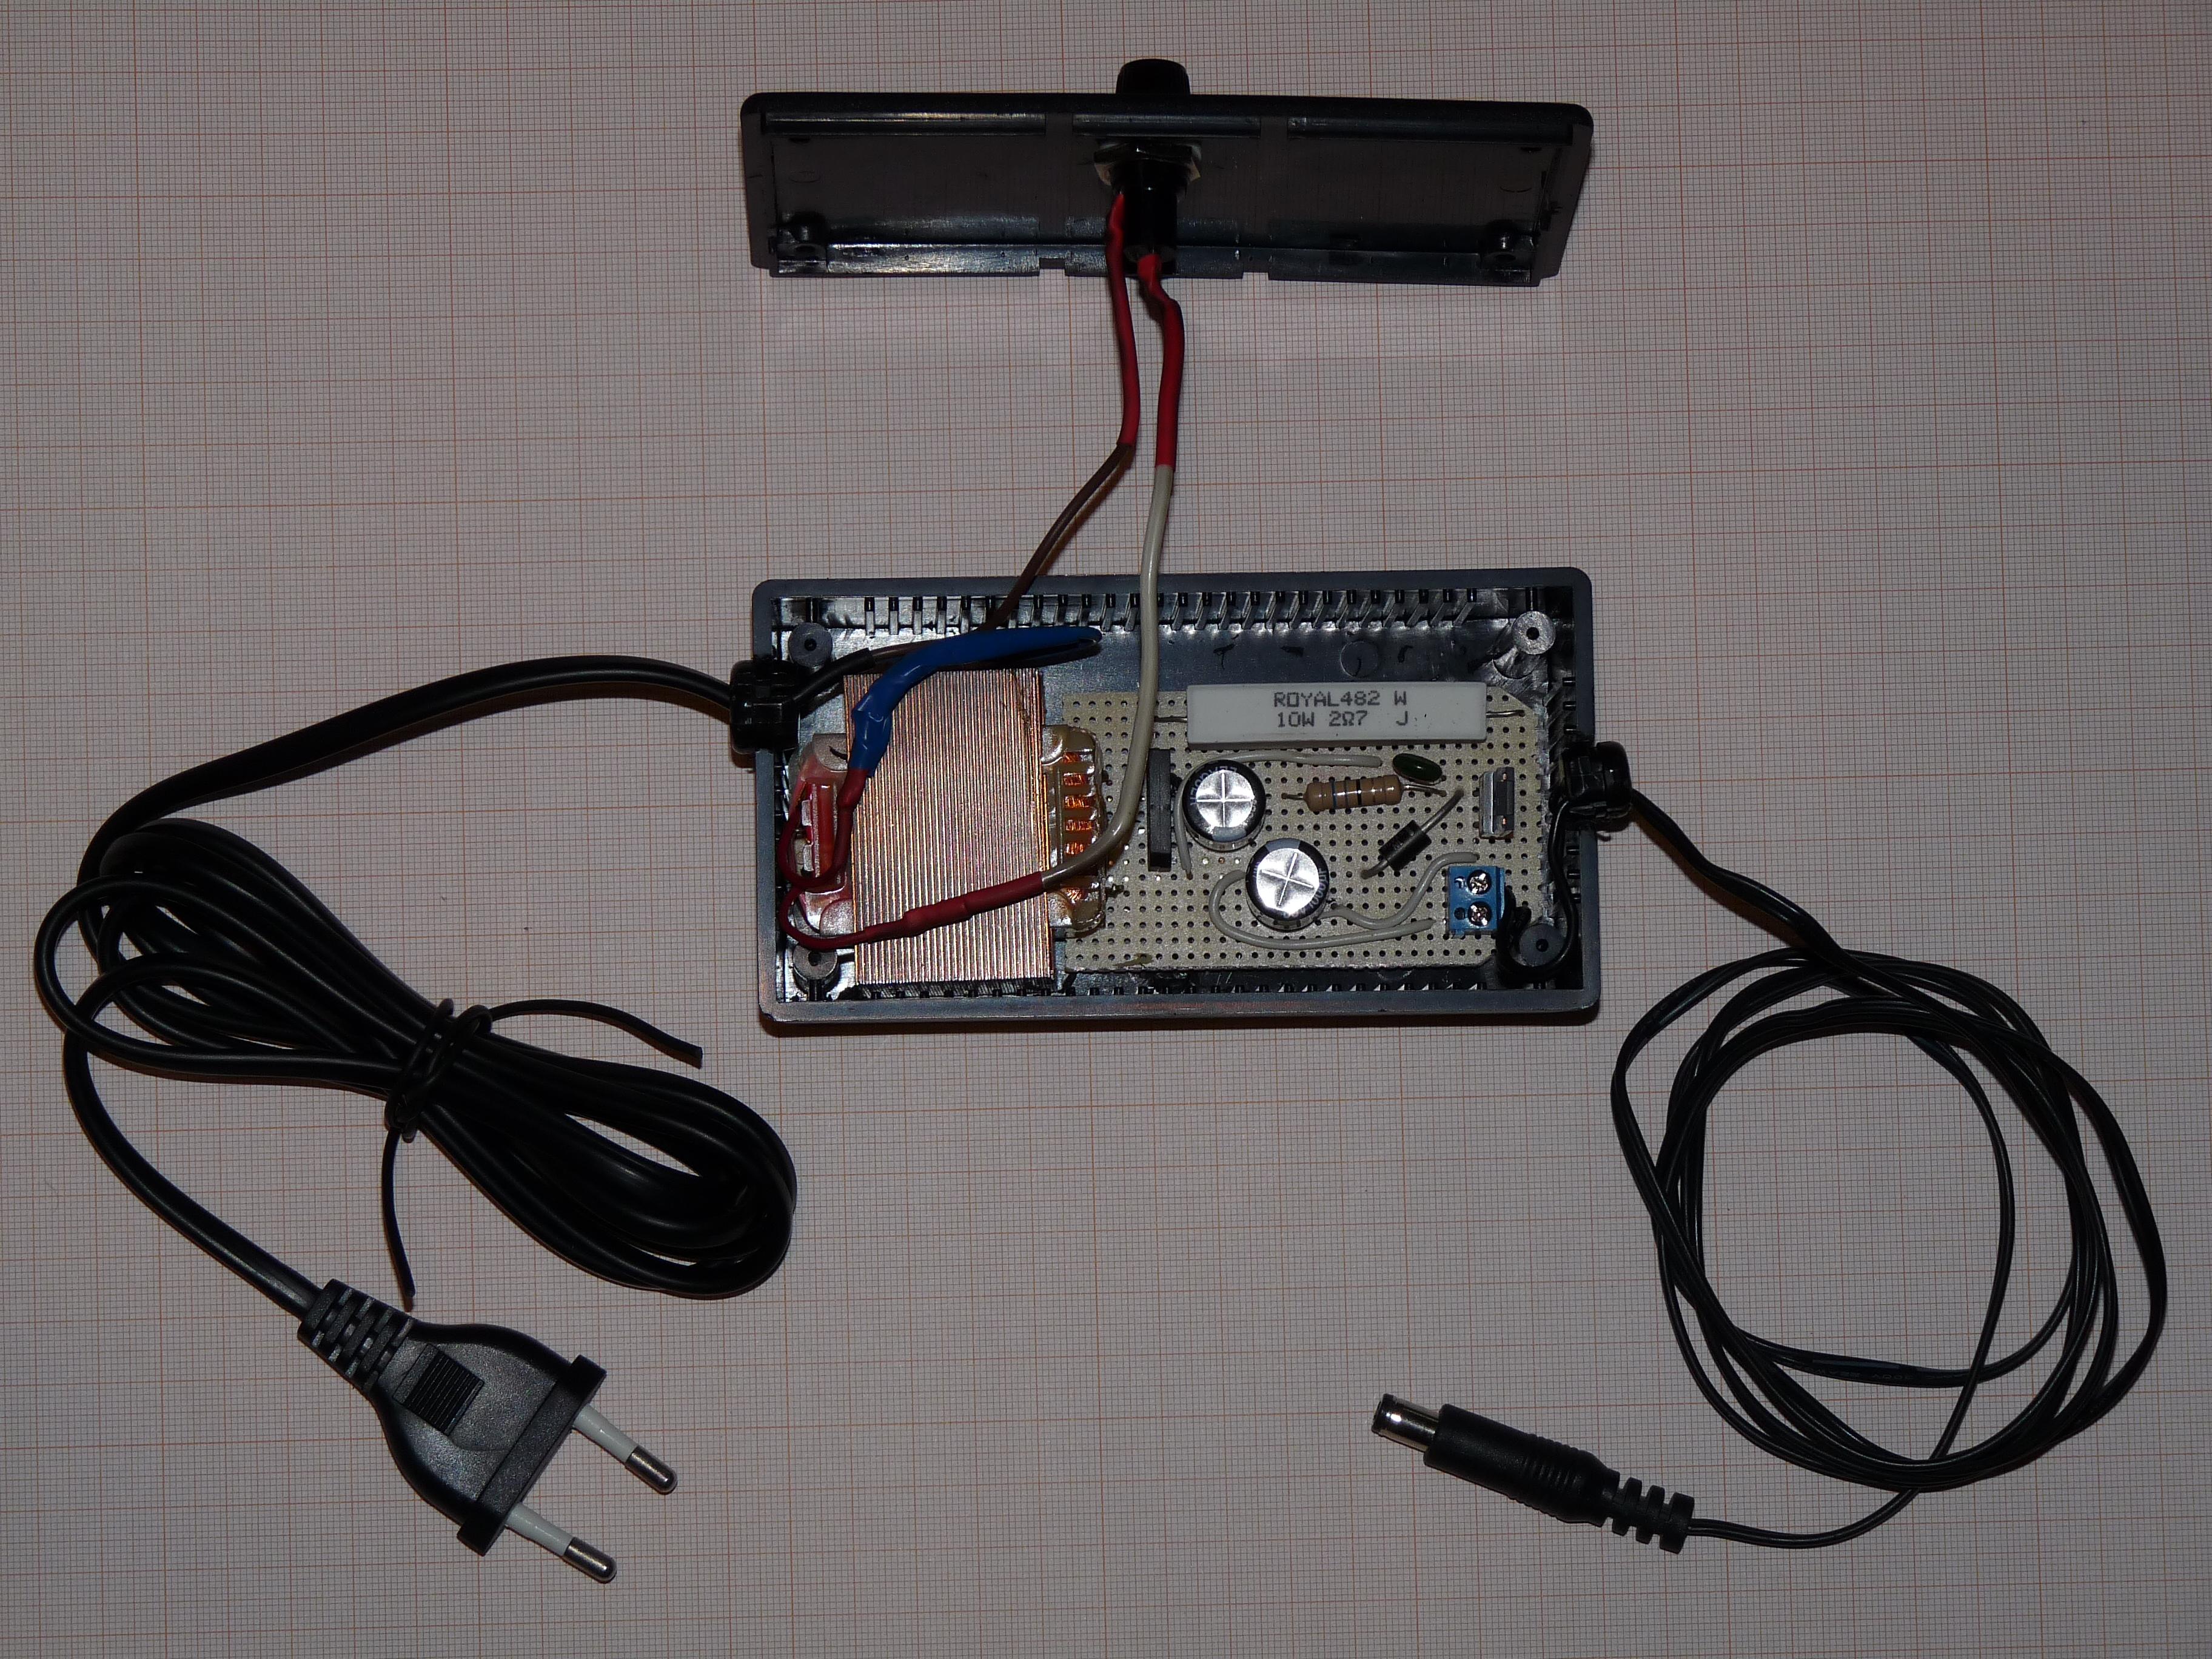 File:DIY power supply 12V 1A.JPG - Wikimedia Commons